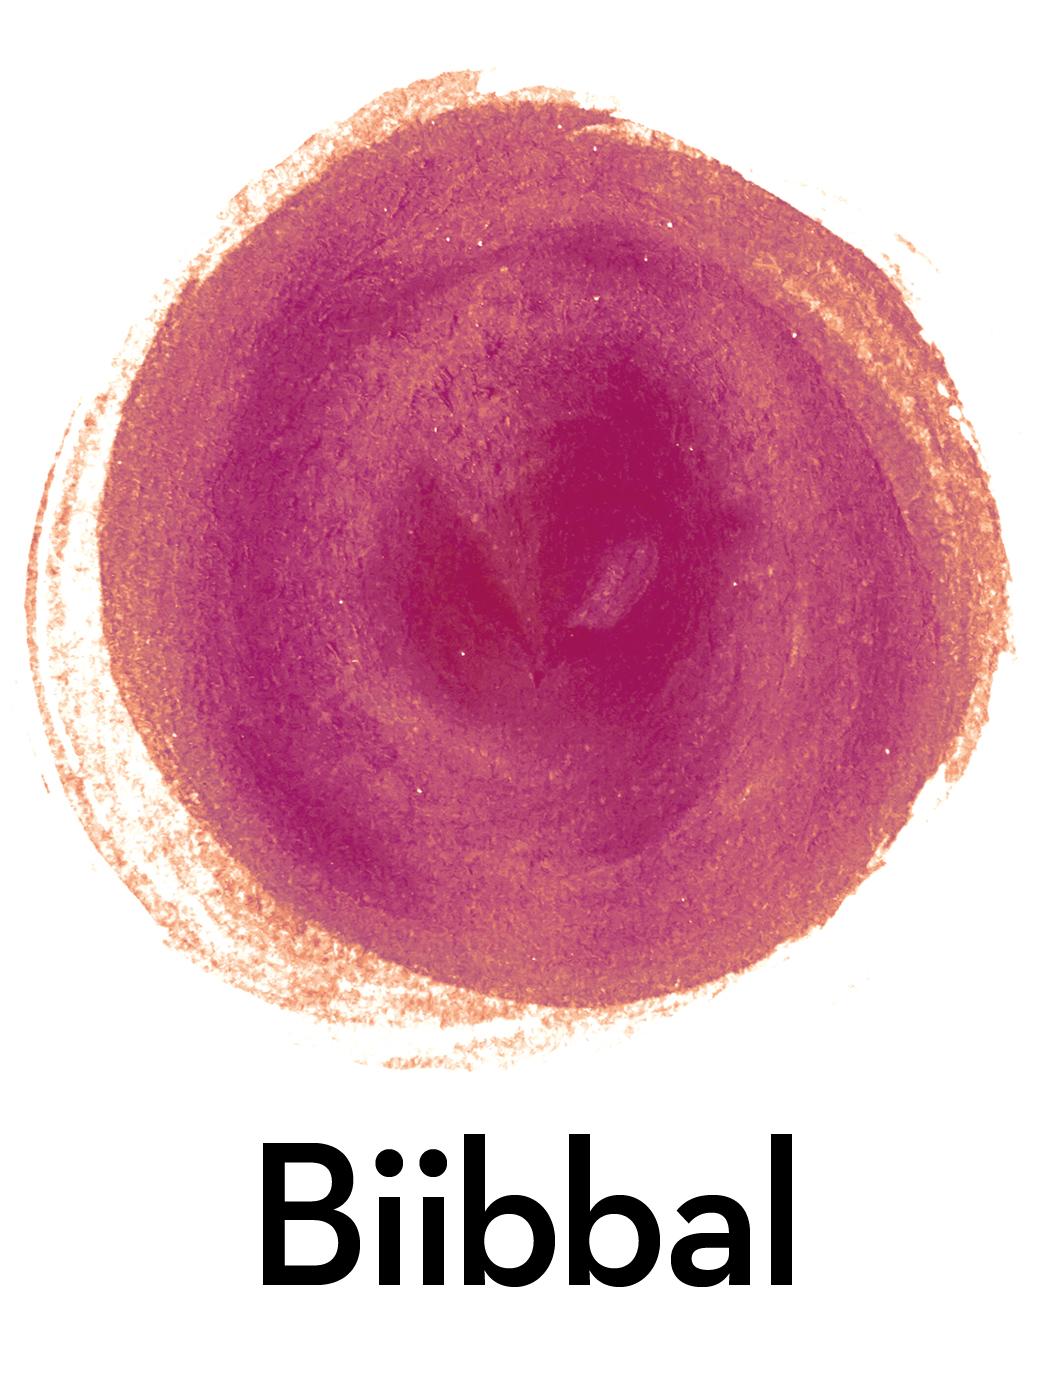 Davvisámegiel Biibbal 2019